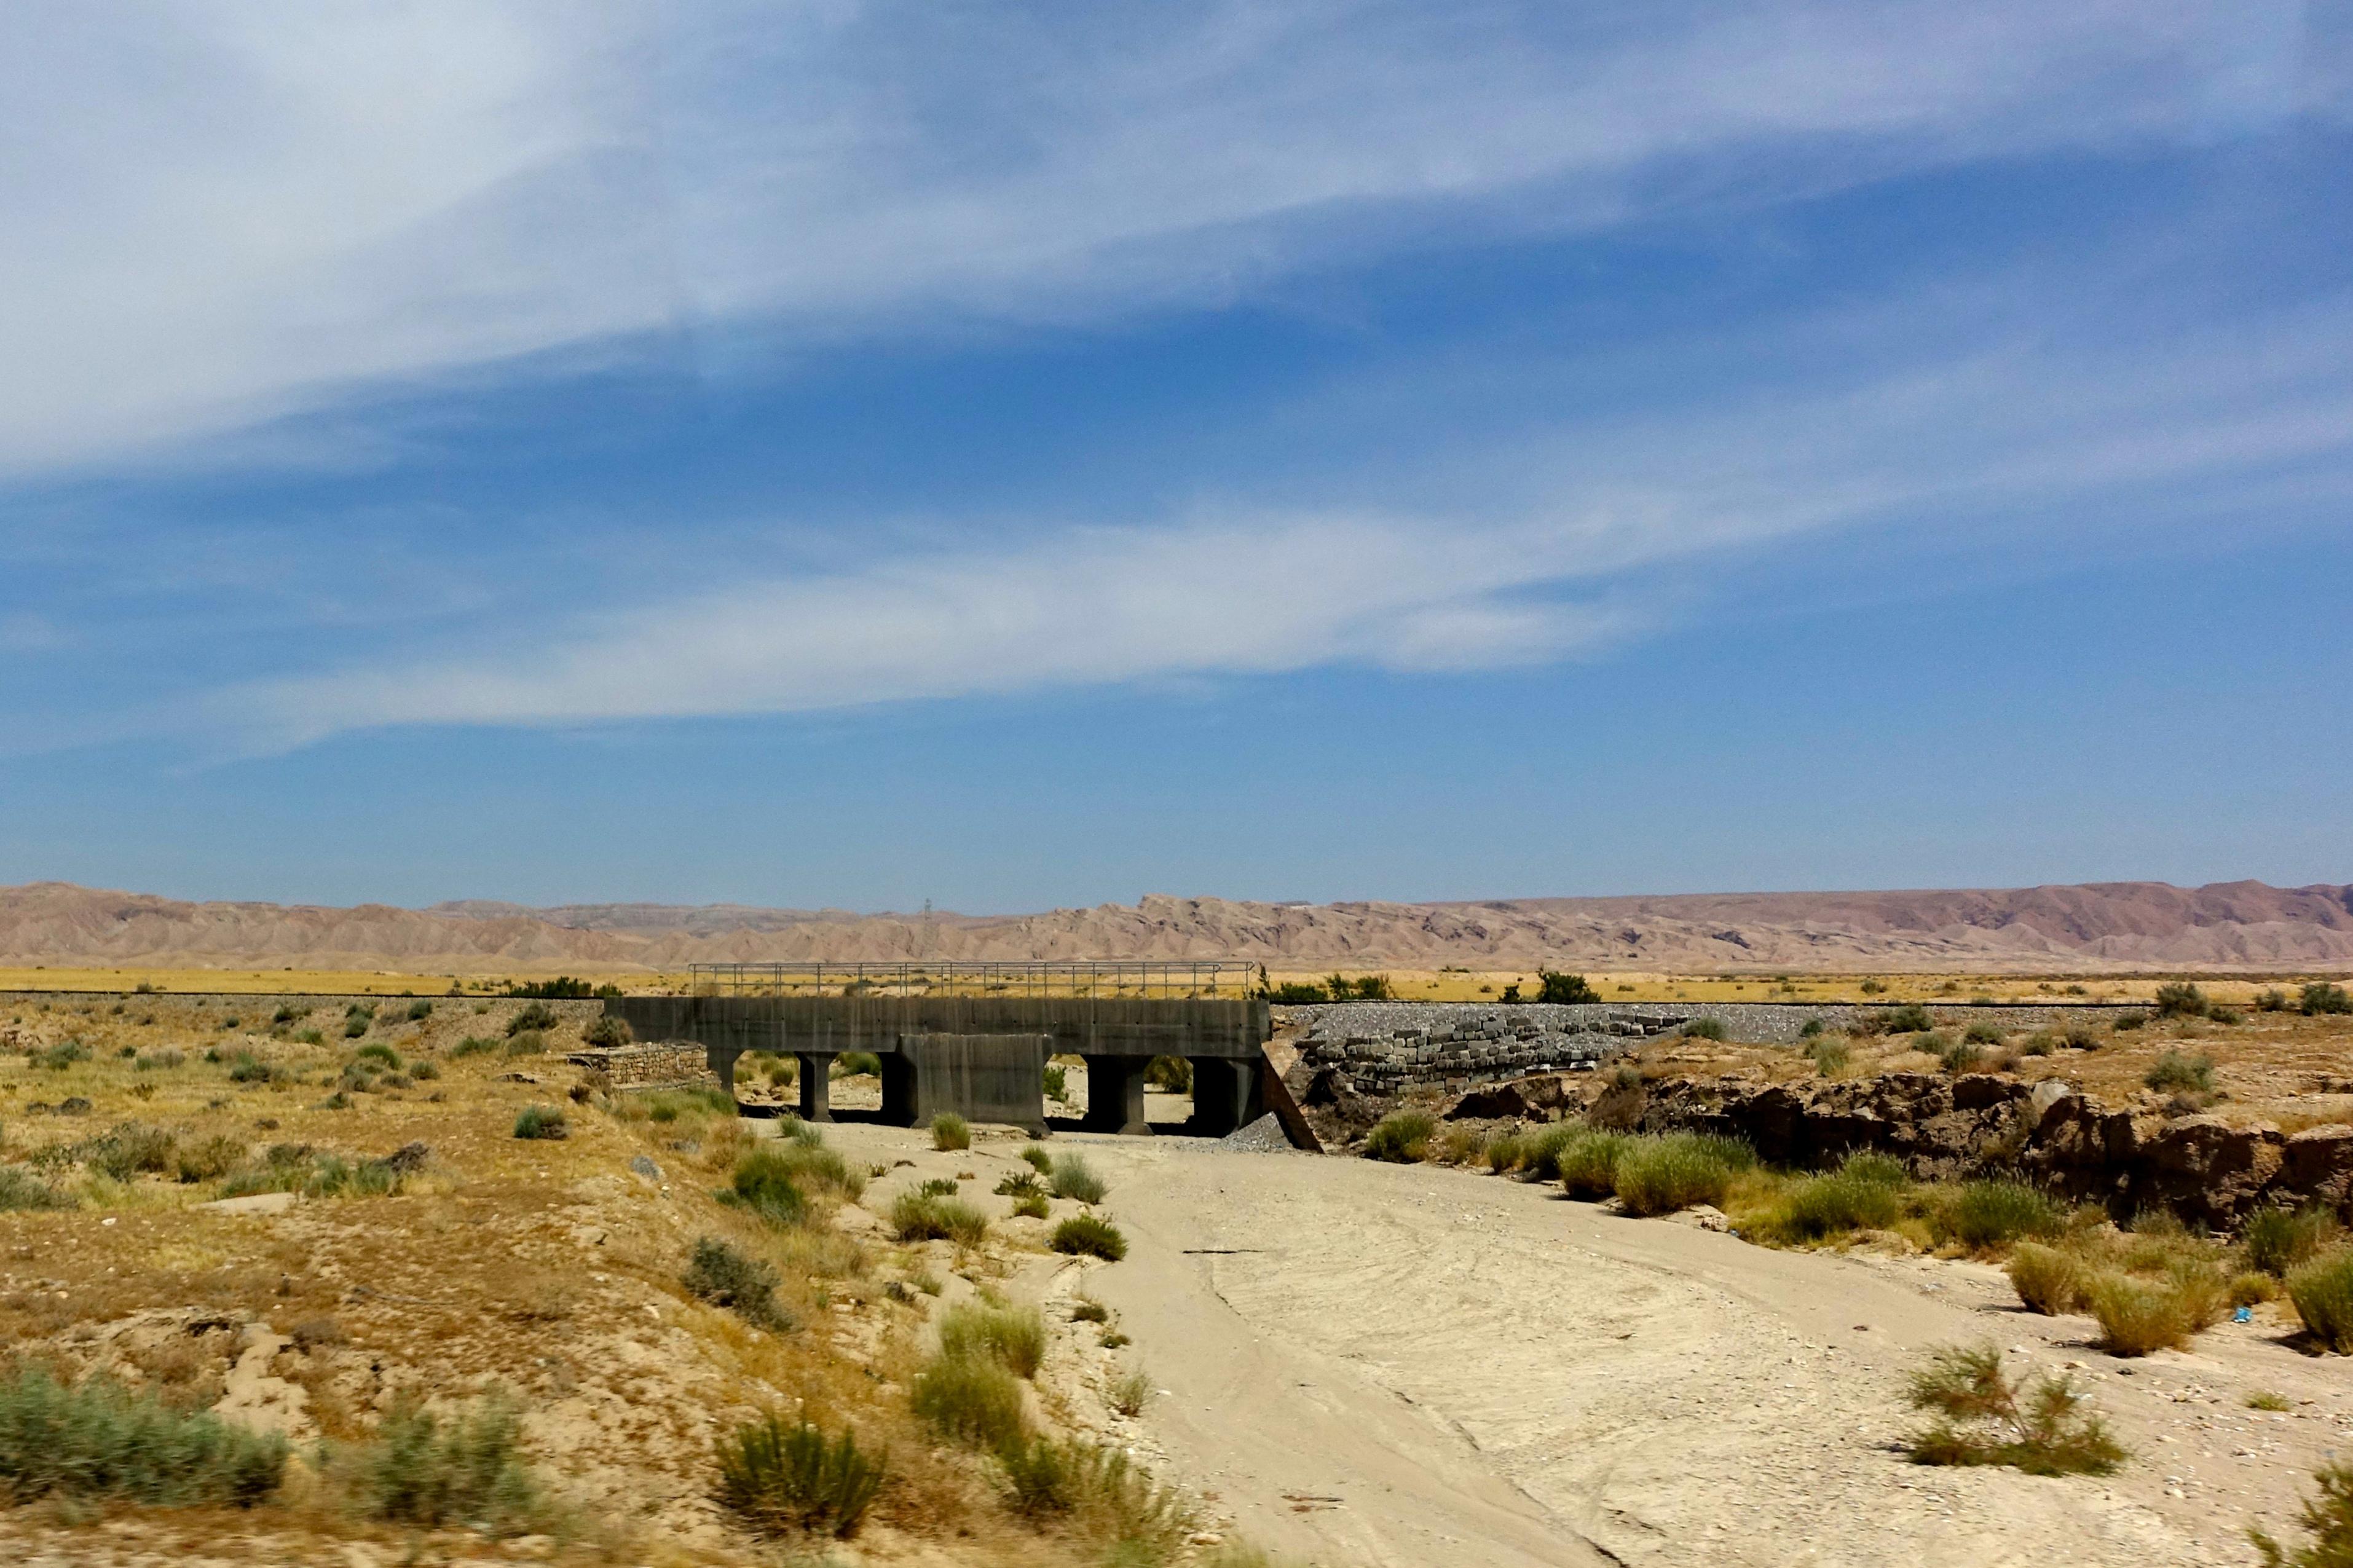 Dry River Bed. Tunisia